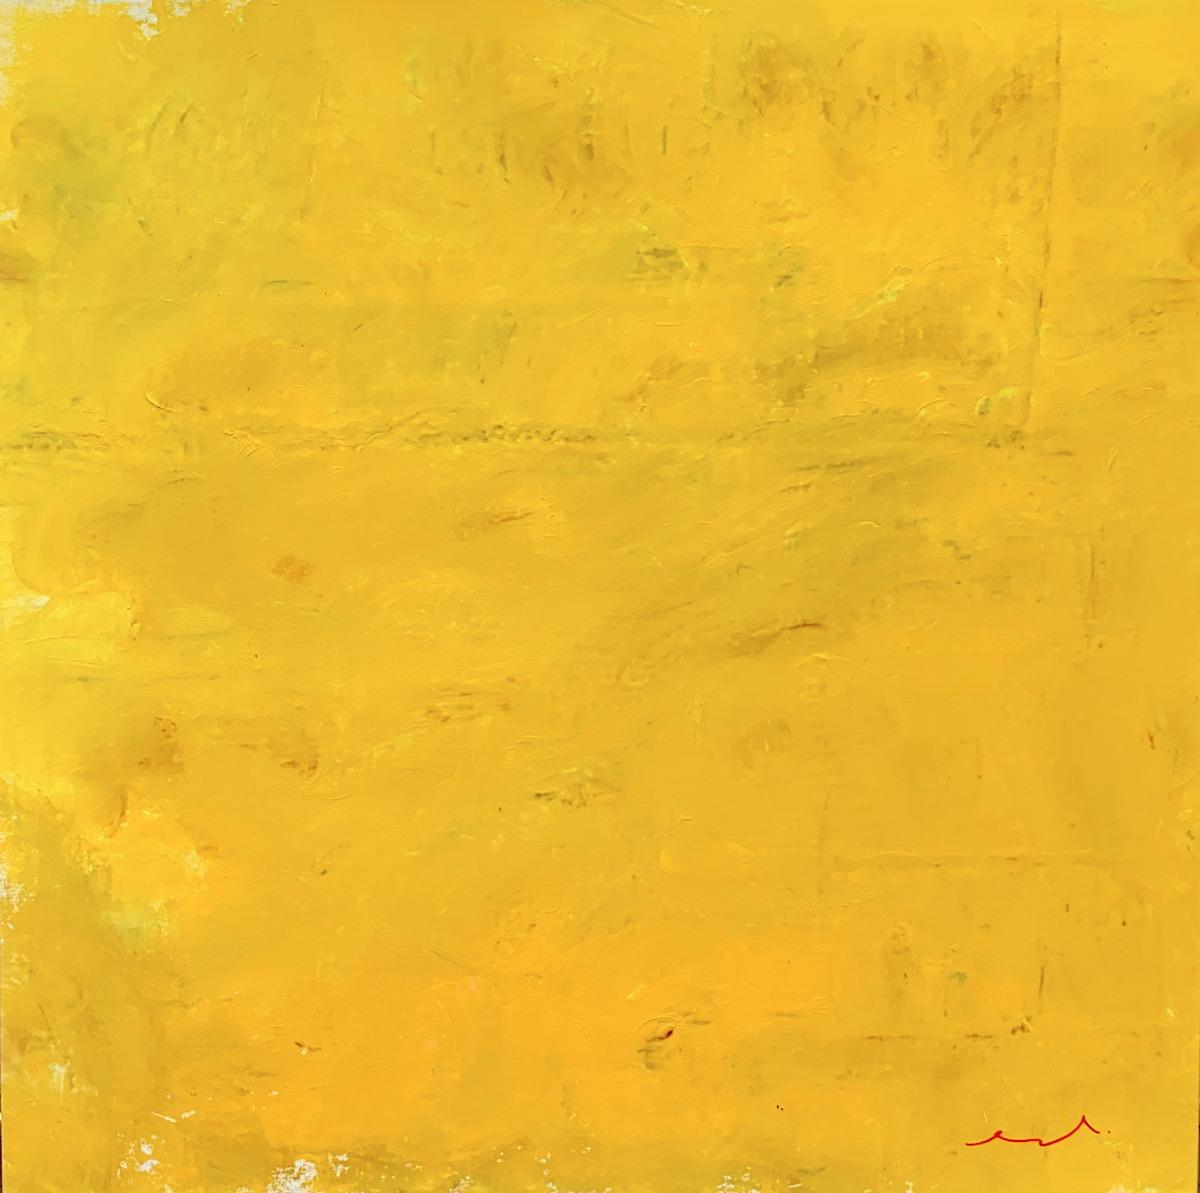 Monochrome jaune